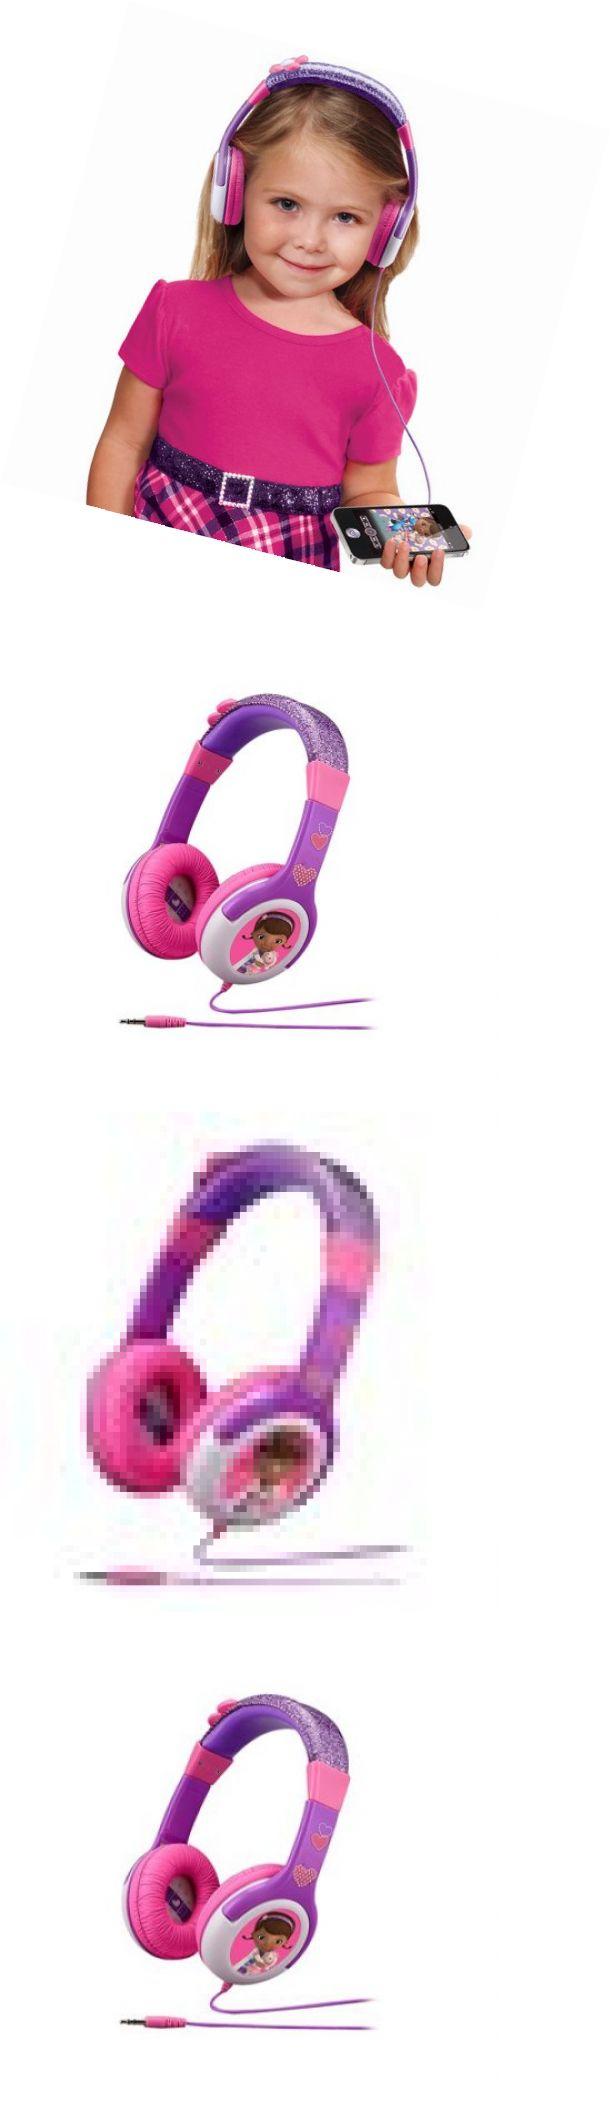 Radios Musical Toys 145943: Disney Doc Mcstuffins Rockin Doc Headphones -> BUY IT NOW ONLY: $33.66 on eBay!